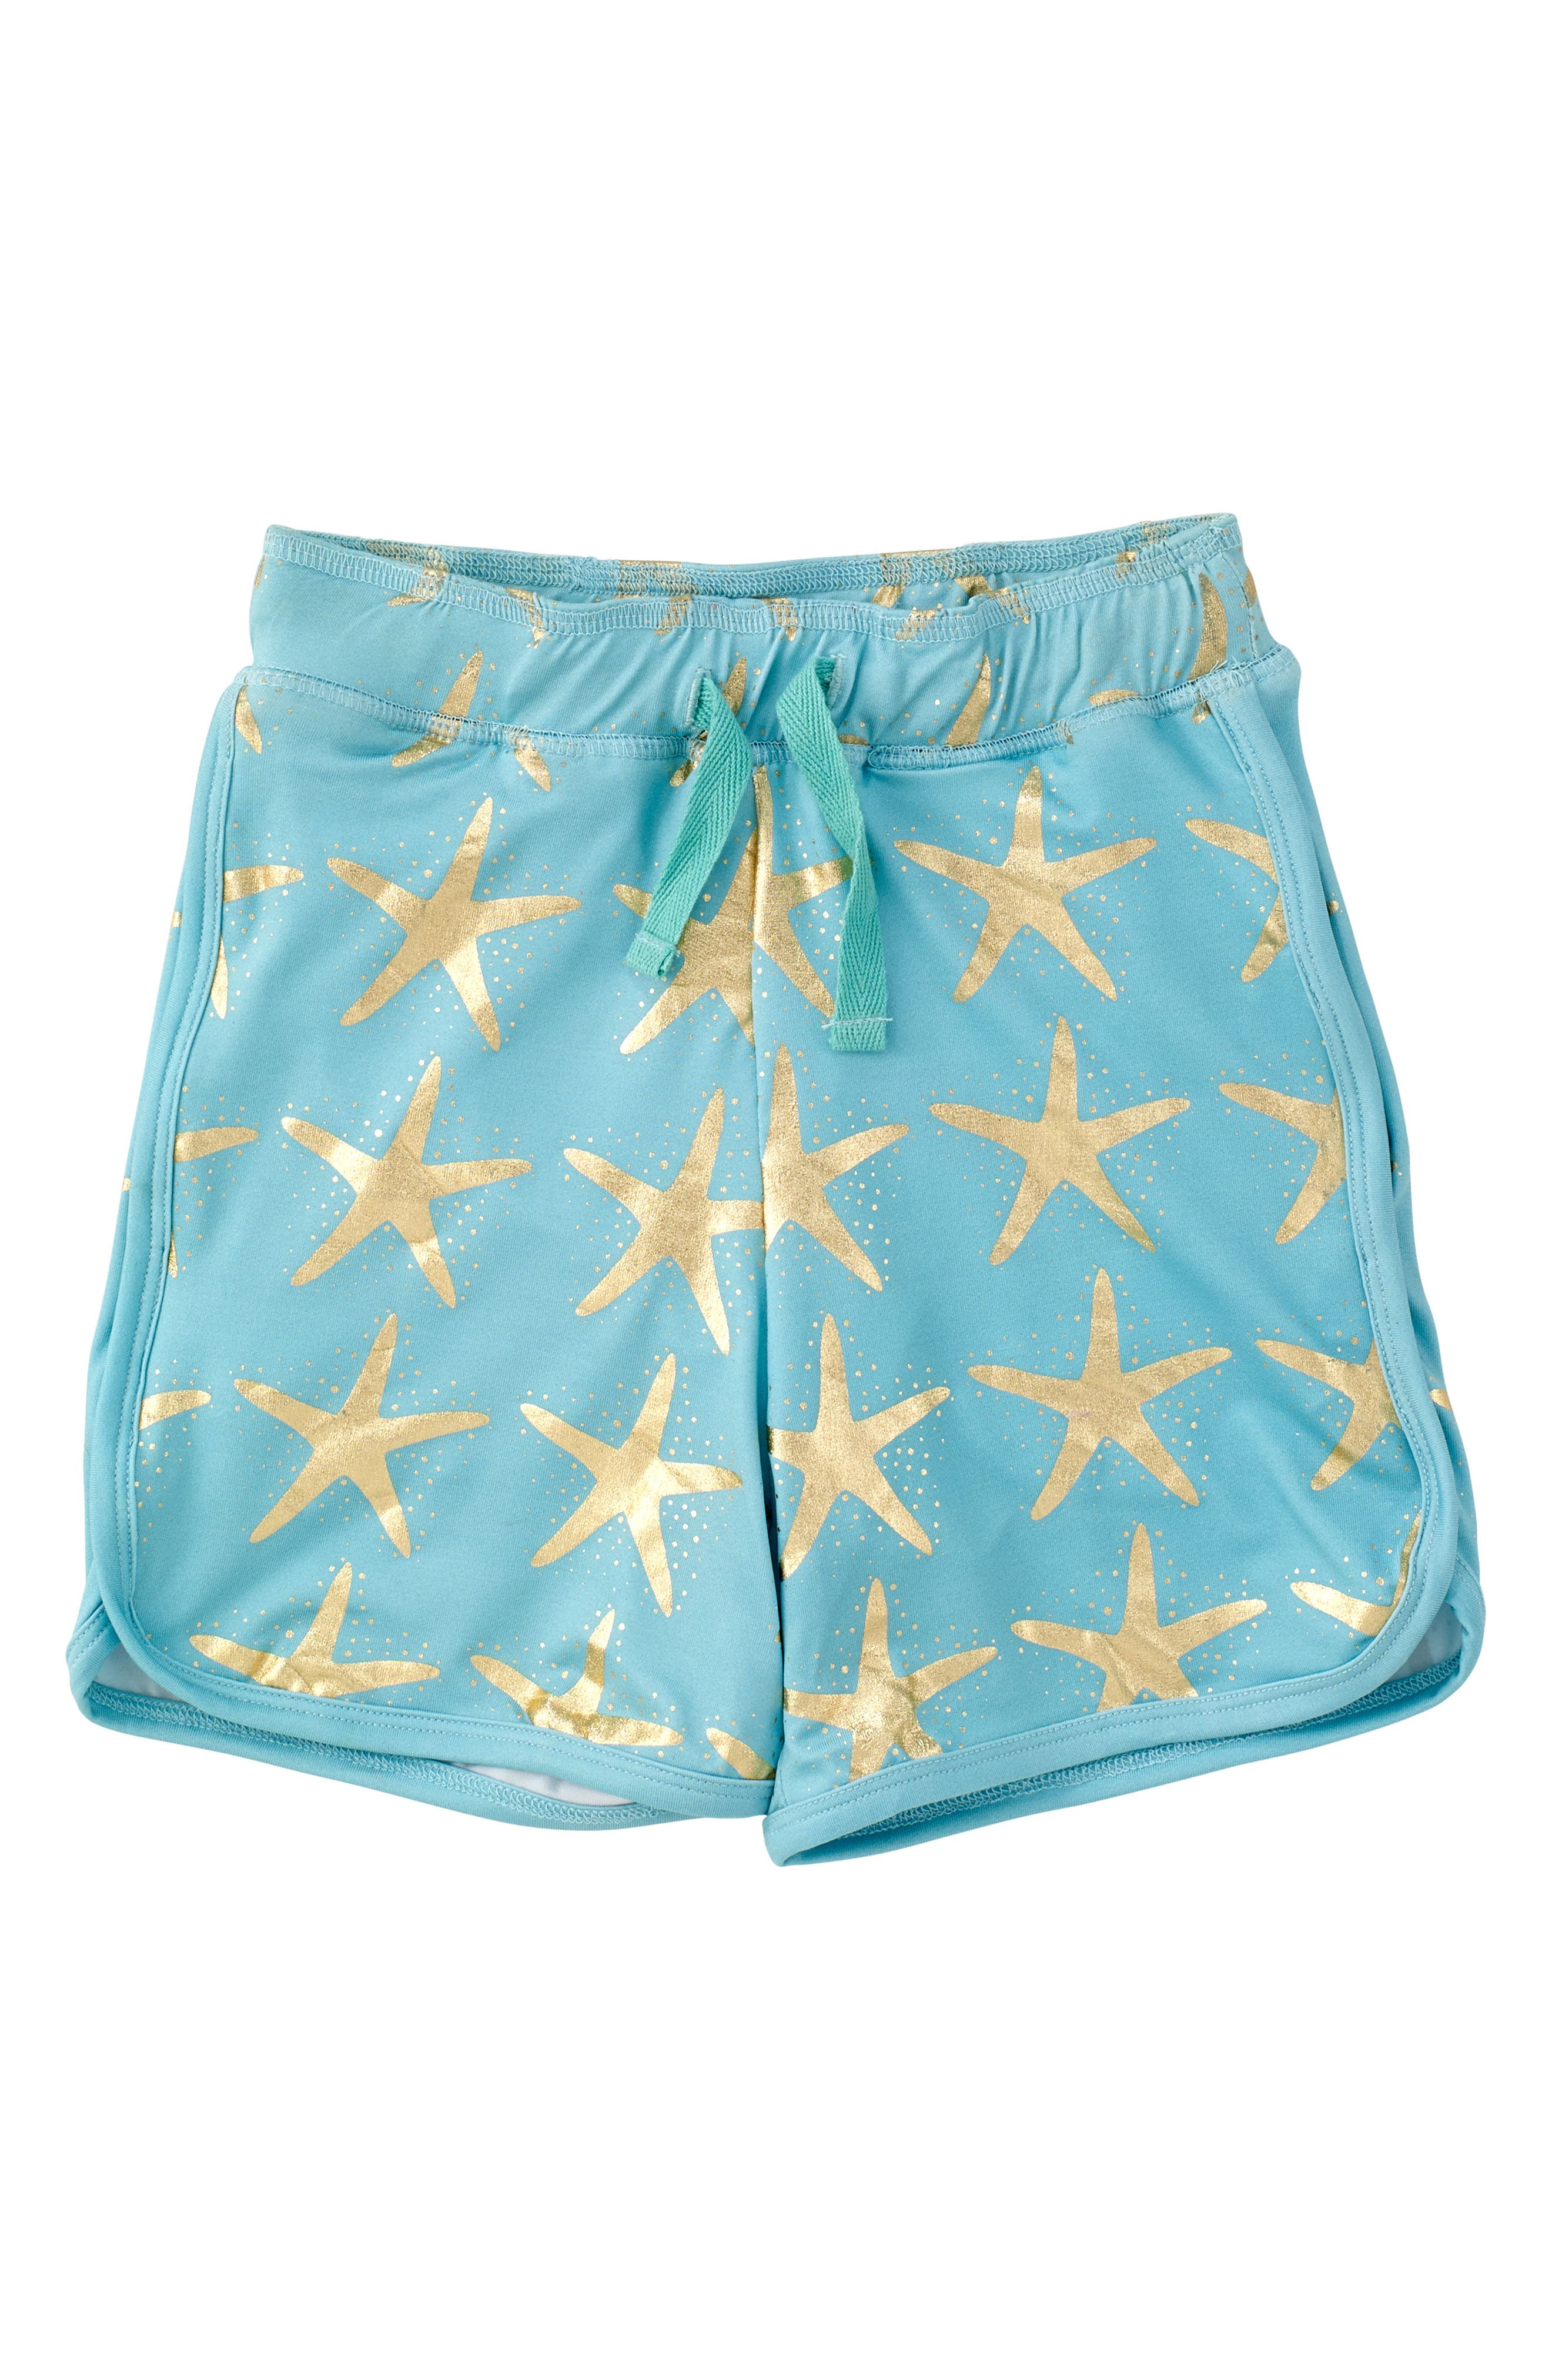 Starfish Swim Trunks,                         Main,                         color, Turquoise